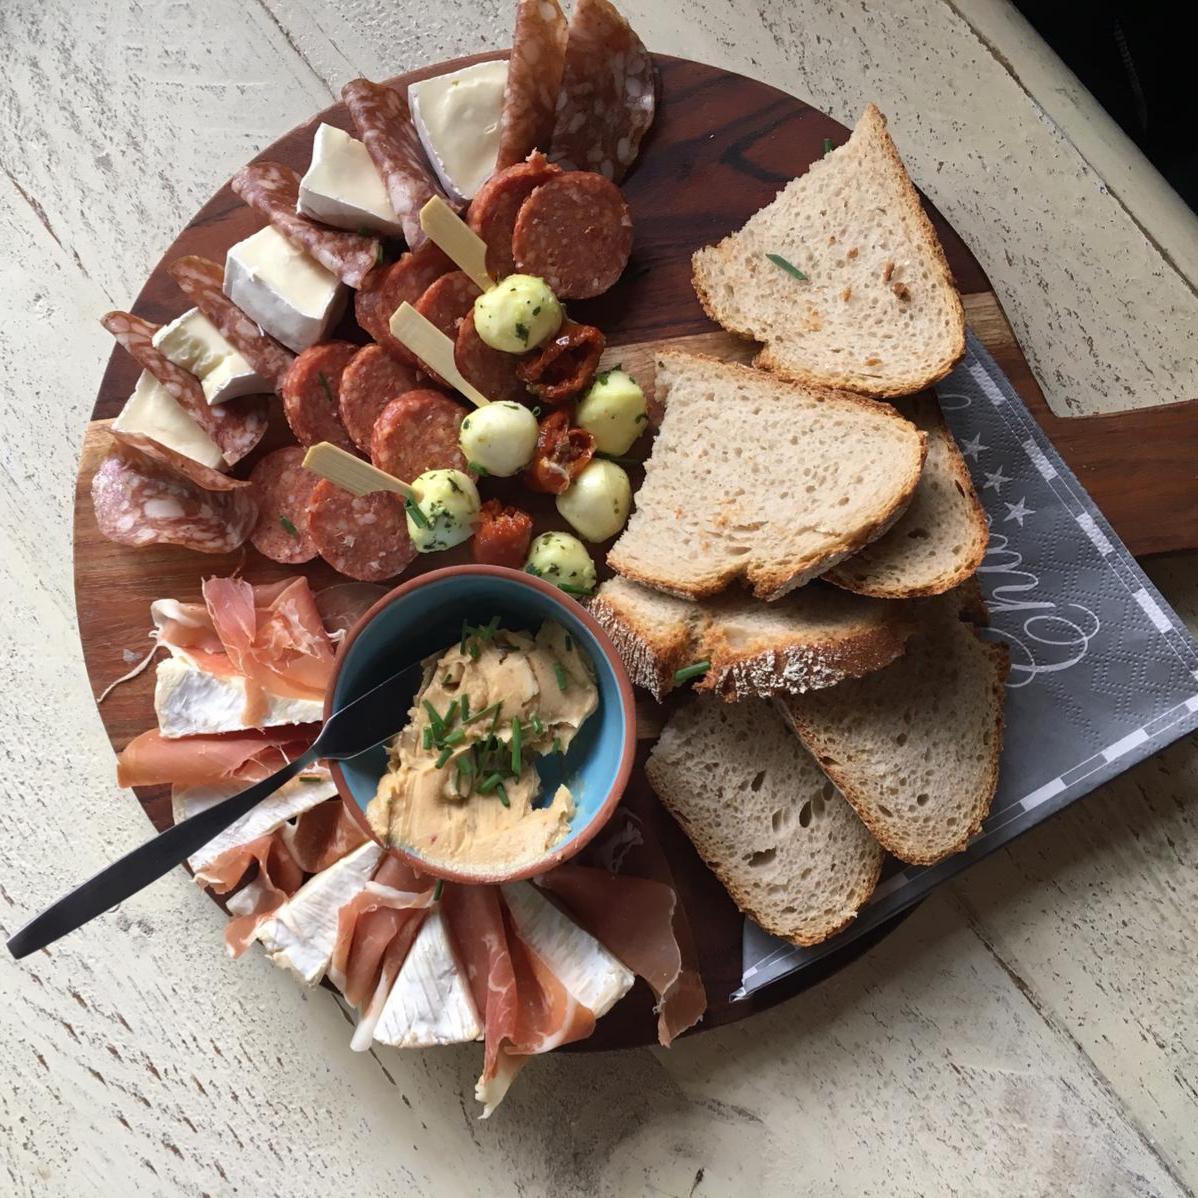 Brasserie De Maasnimf - Broodplankje